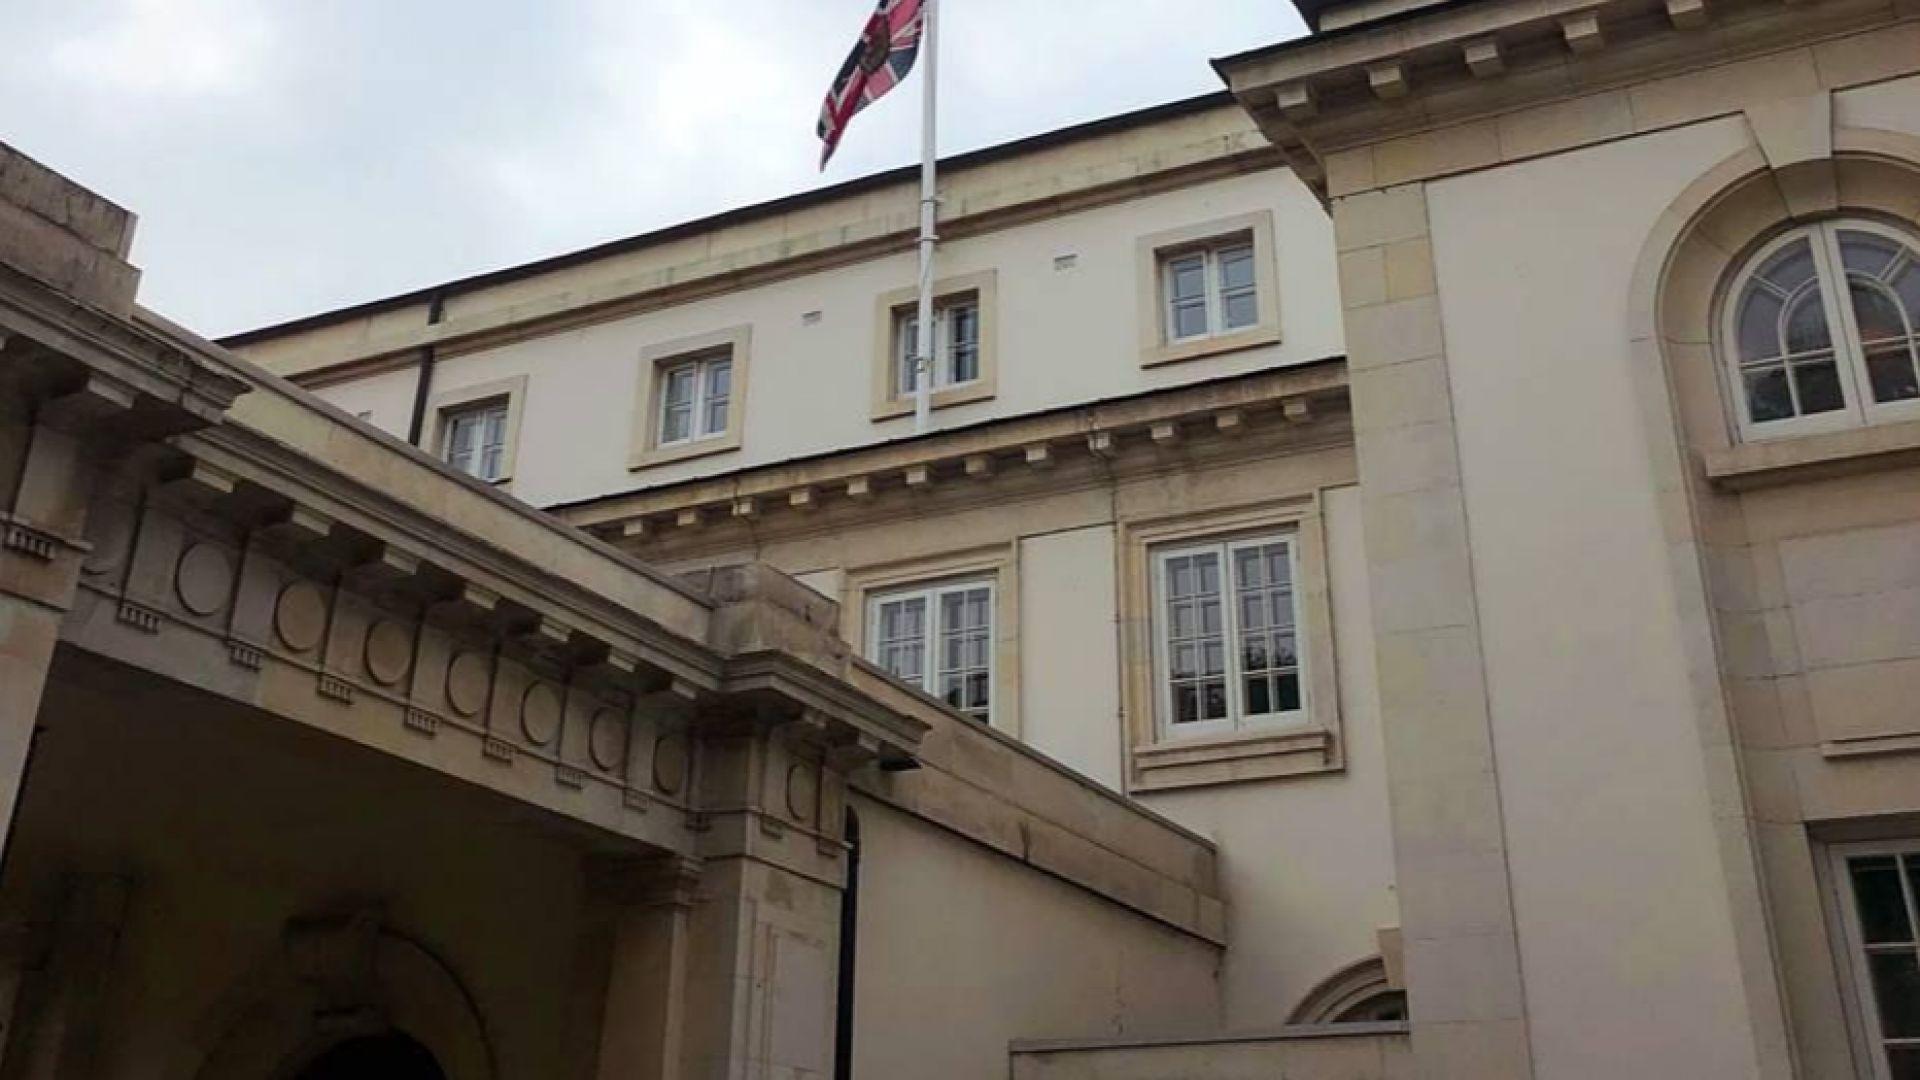 Британското посолство: Следим случая за шпионаж, подкрепяме България